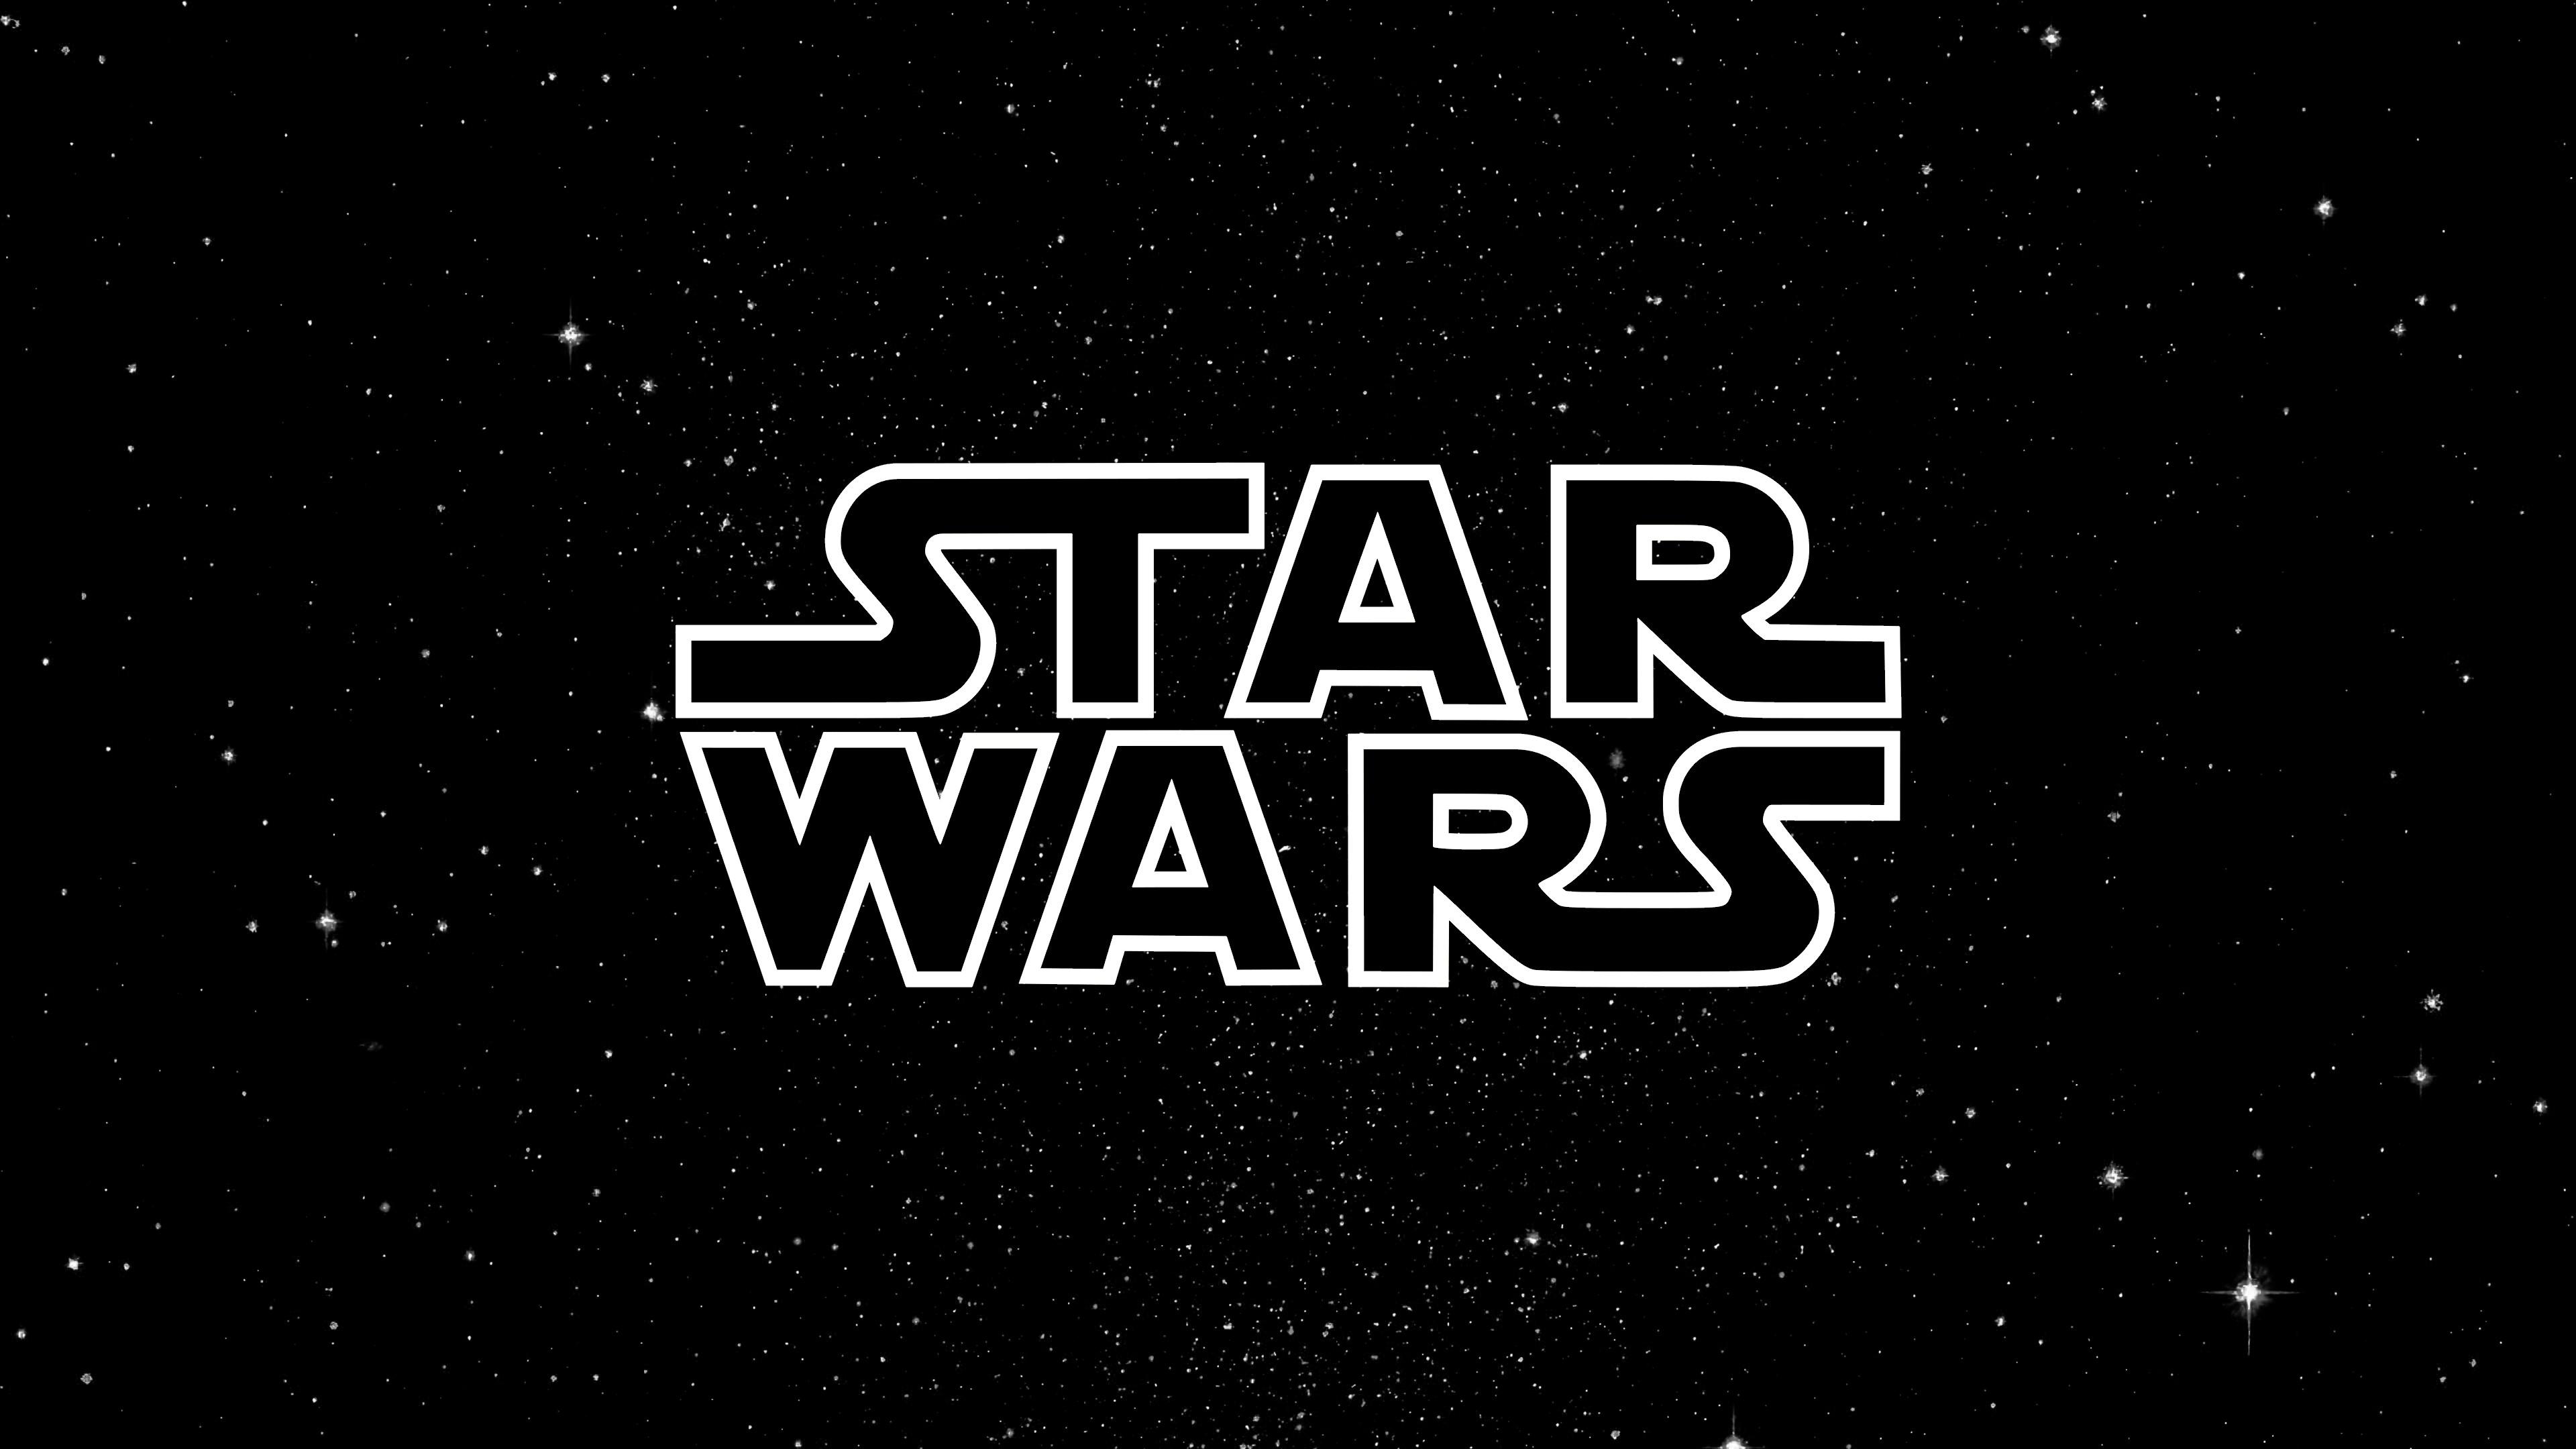 Star Wars | My Idea For A Jedi Order